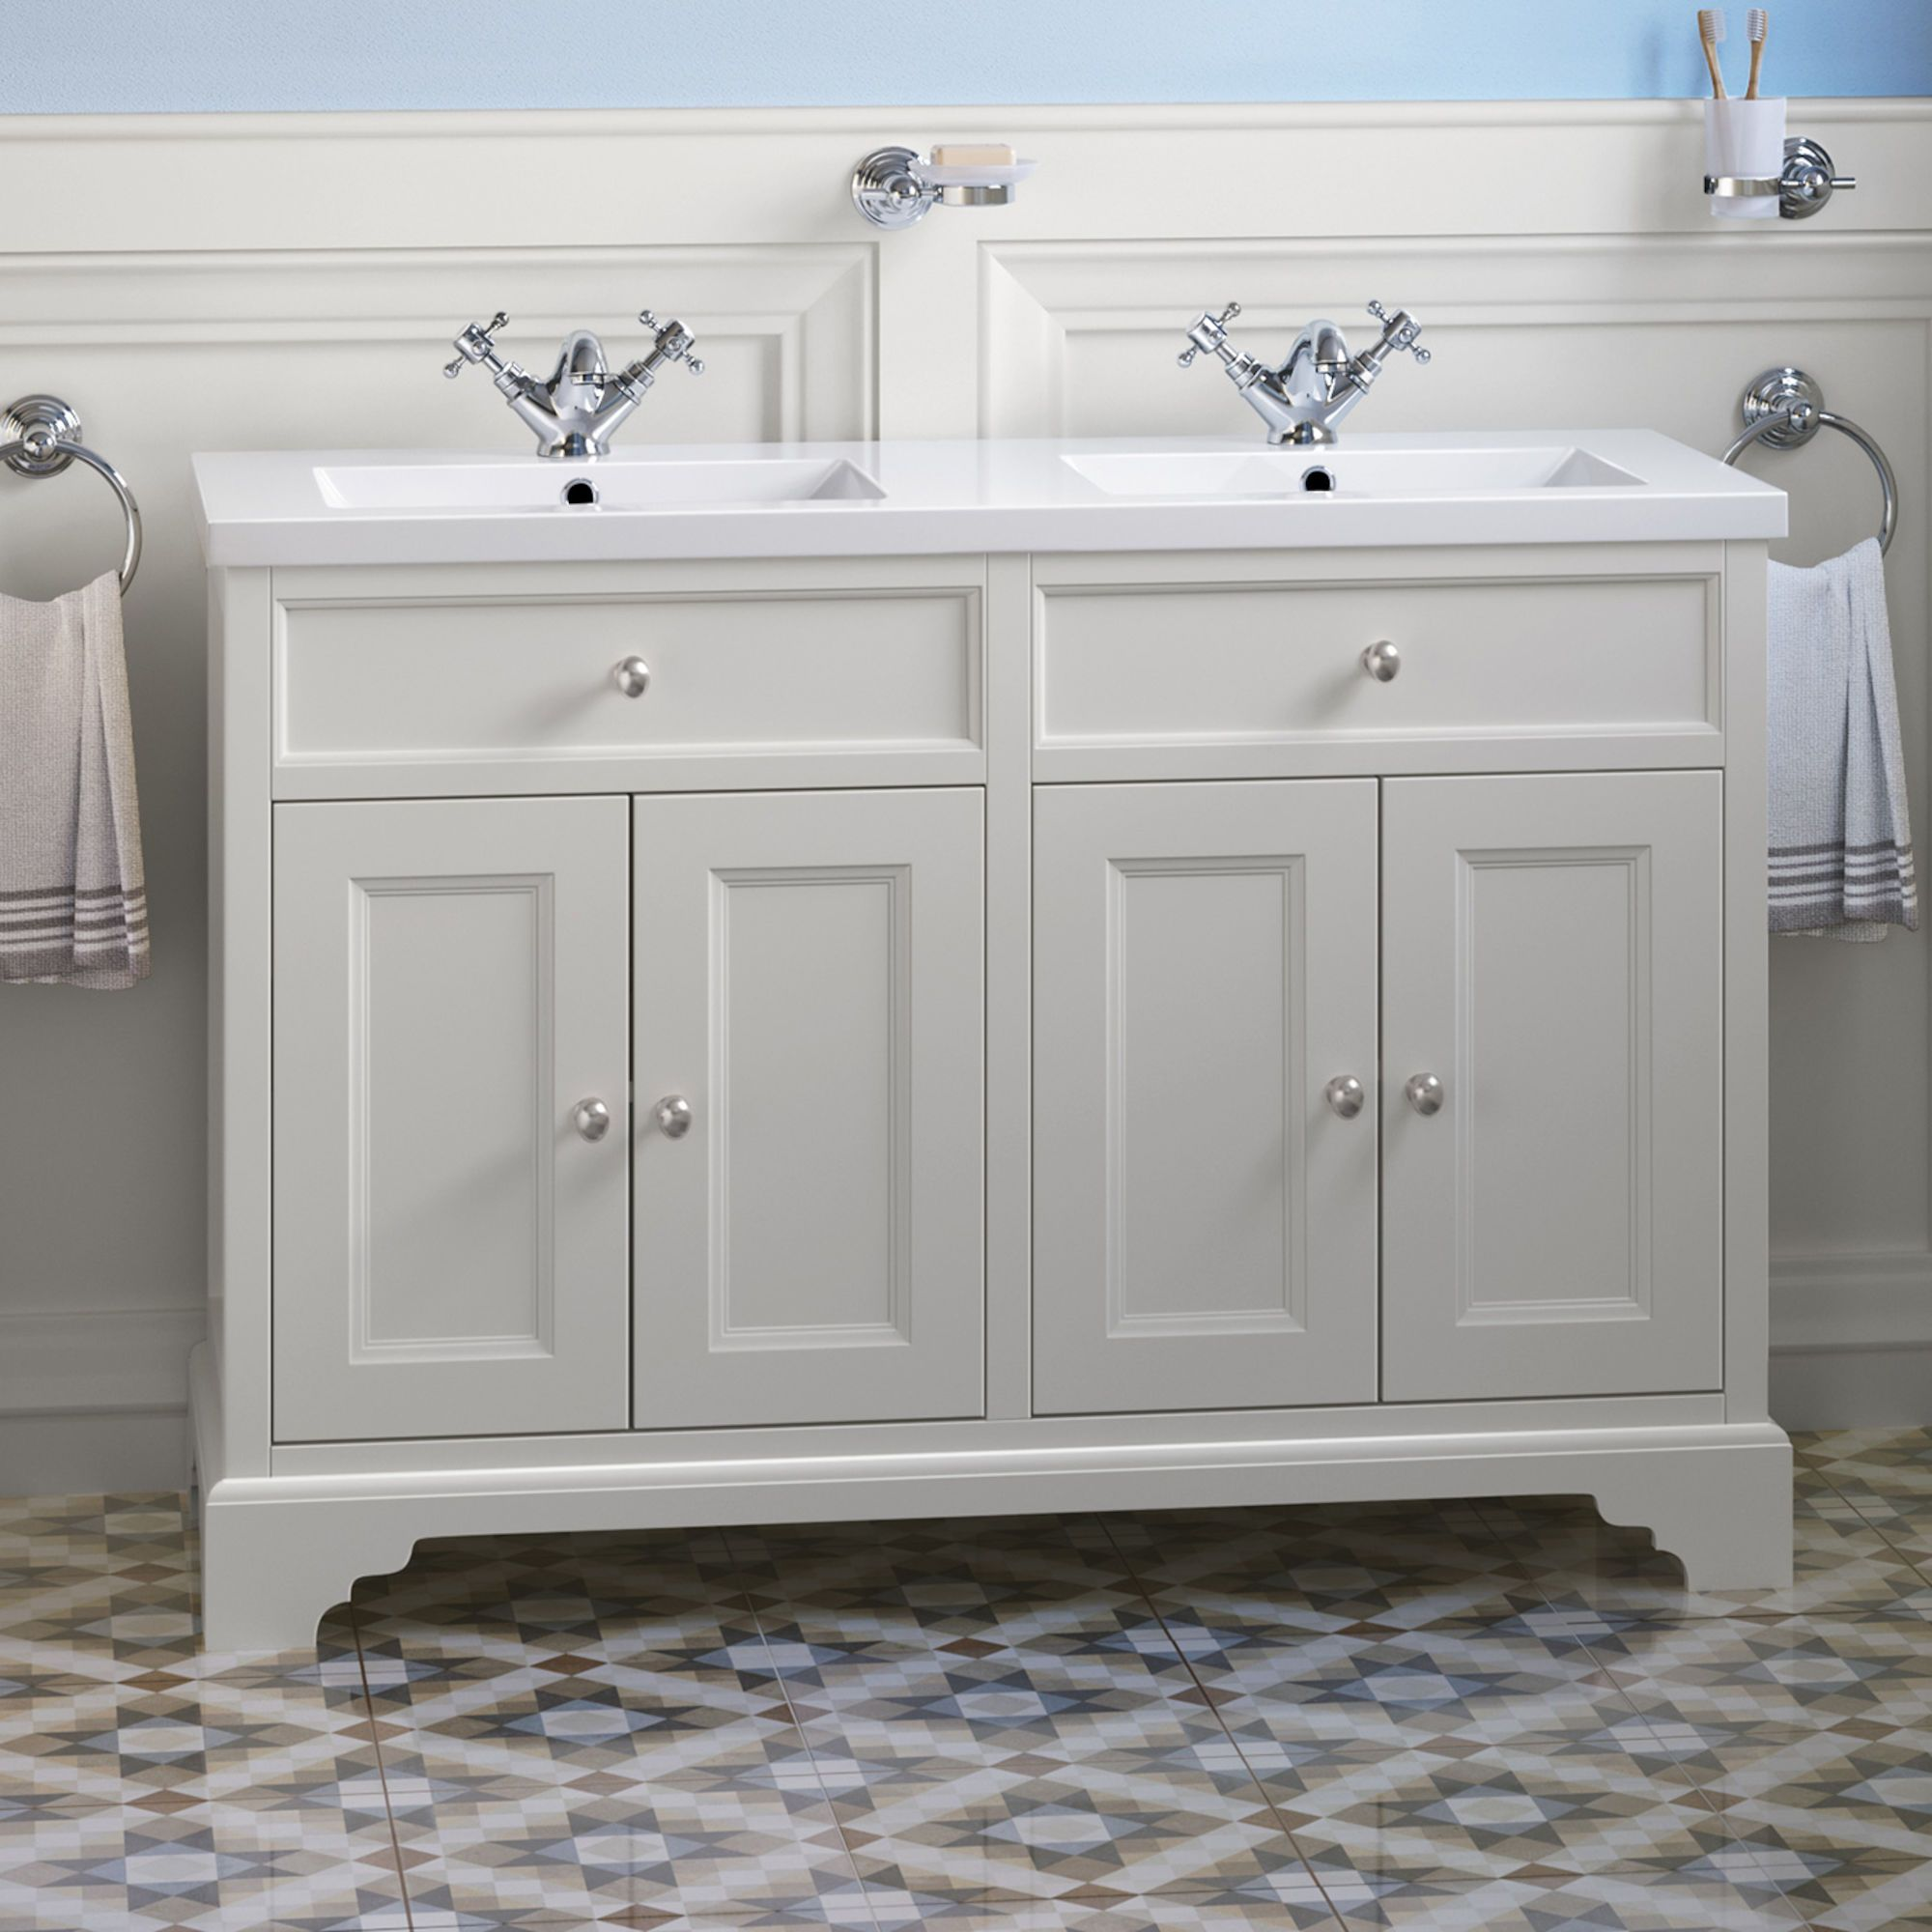 1200mm Loxley Chalk Double Basin Vanity Unit Floor Standing